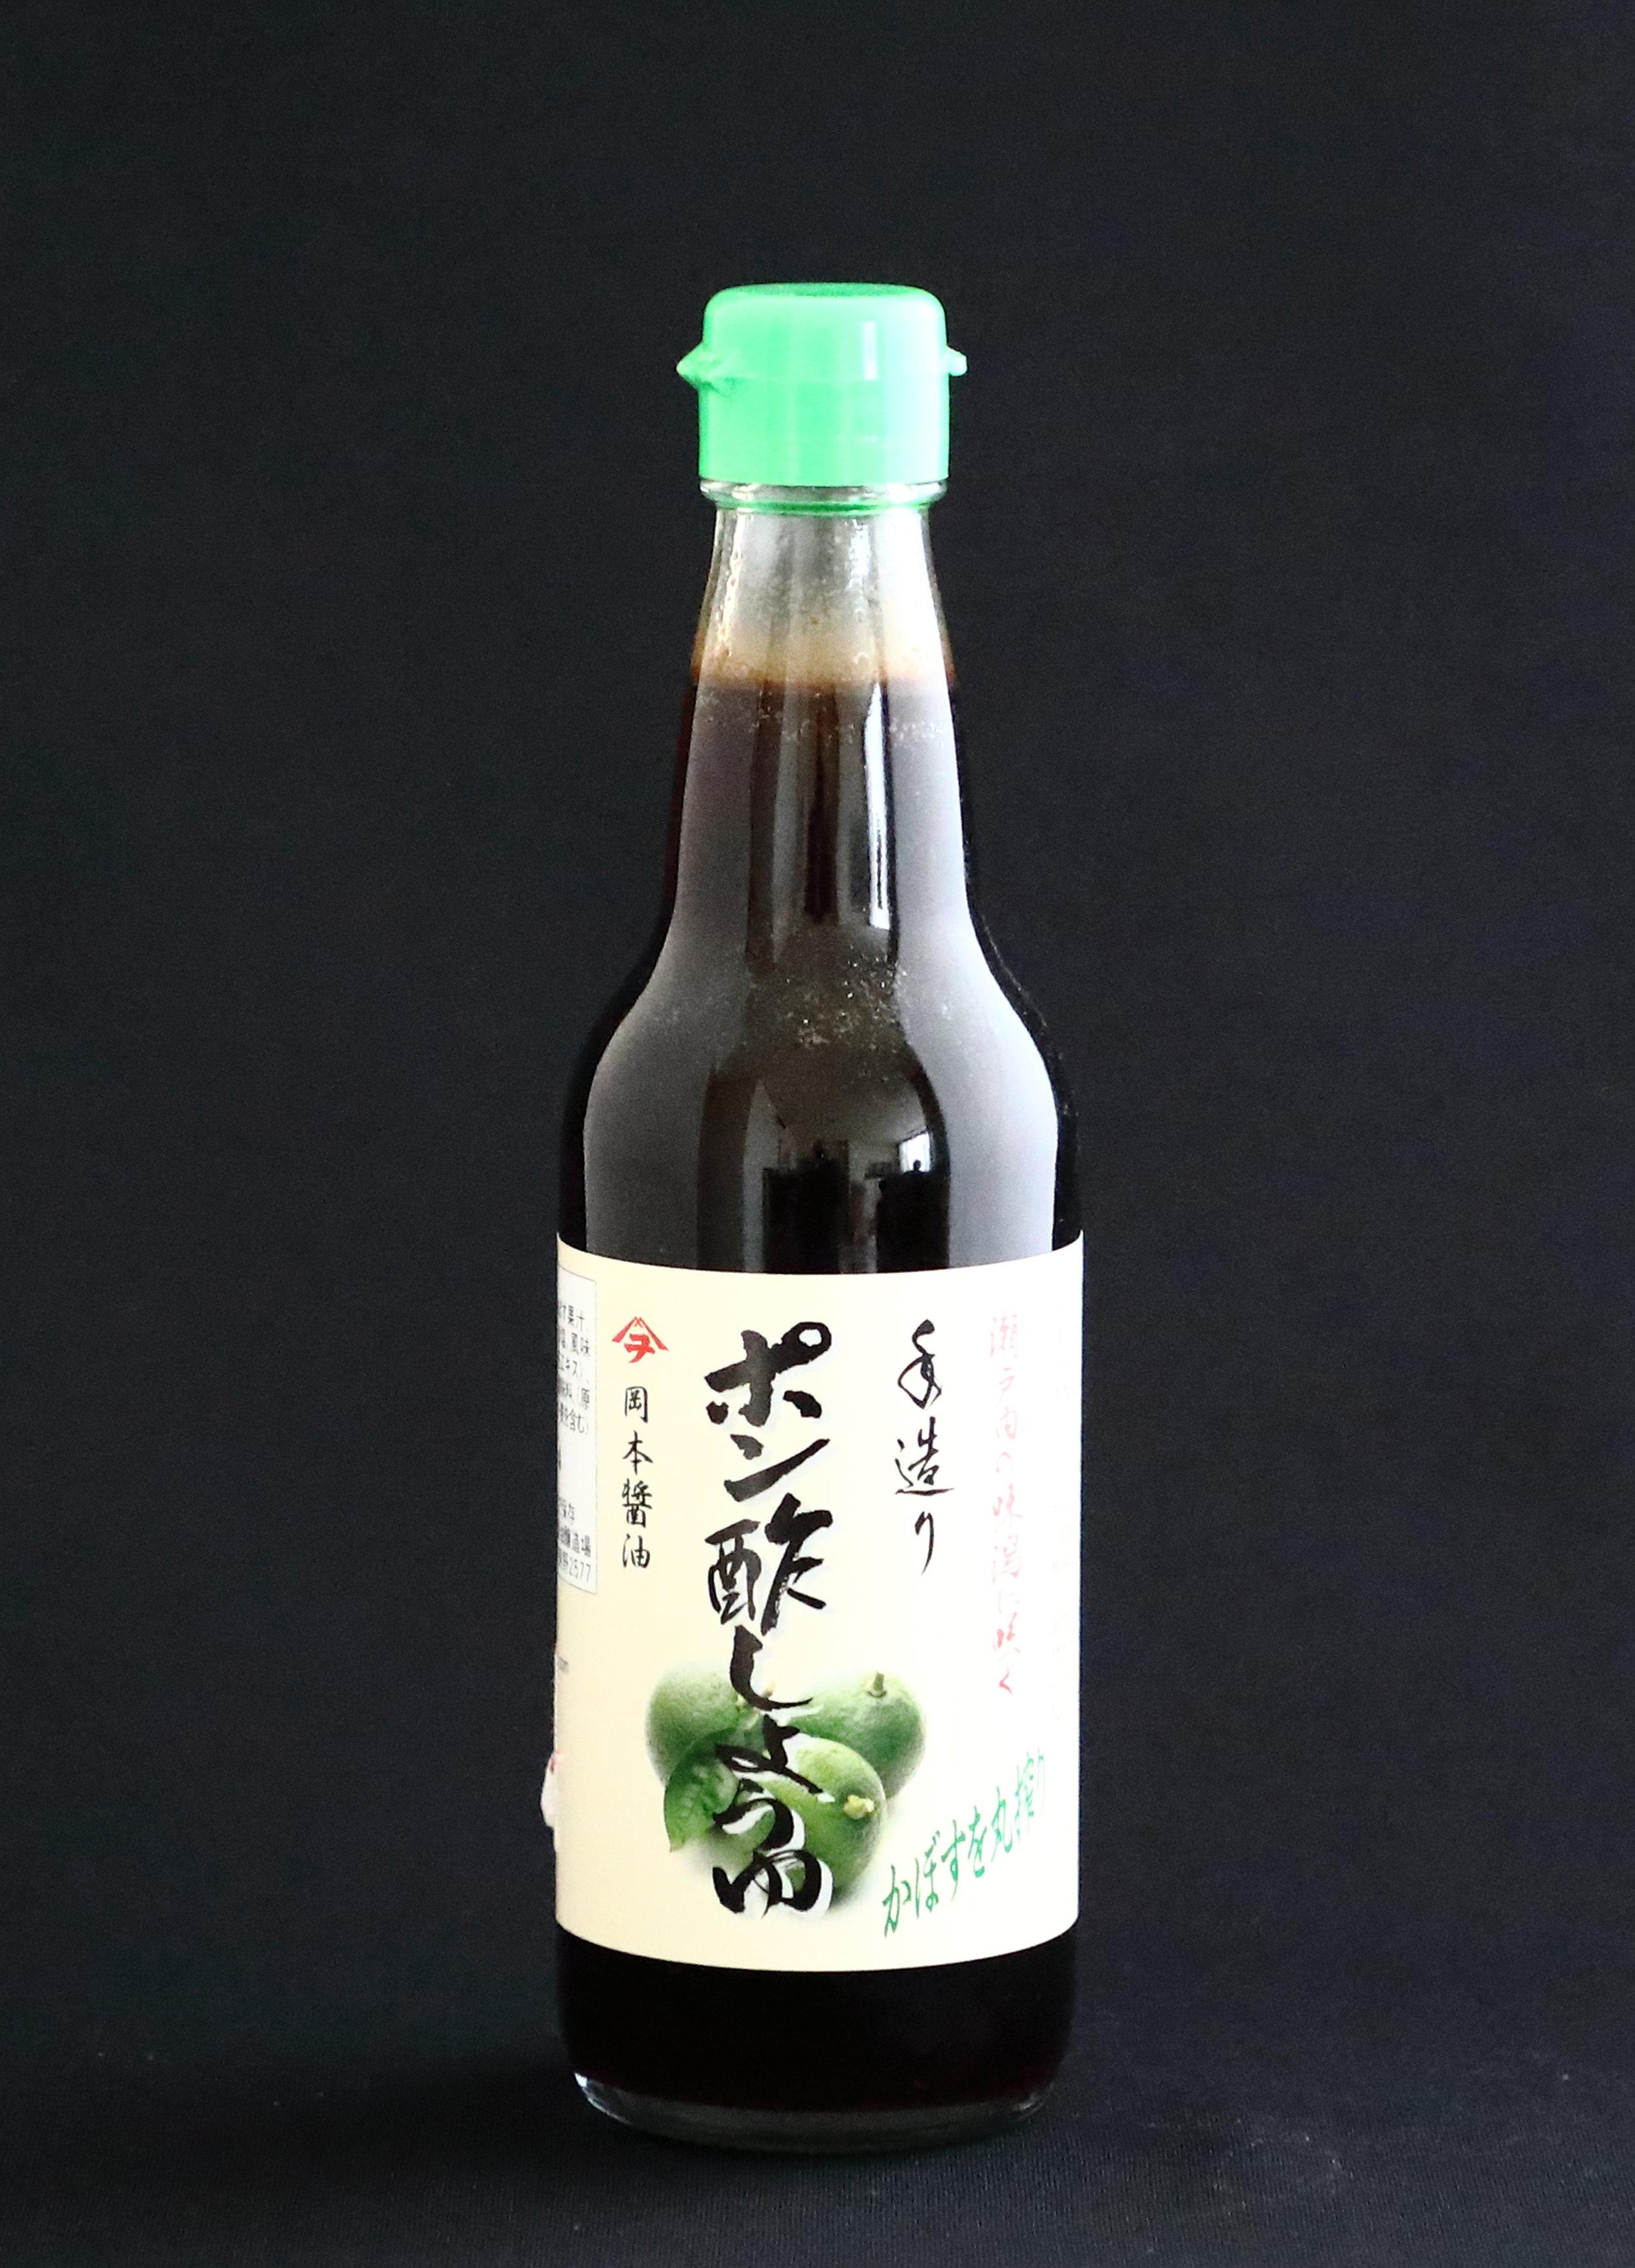 Okamoto's  ponzu  sauce is a blend of its  koikuchi  soy sauce and  kabosu  citrus.